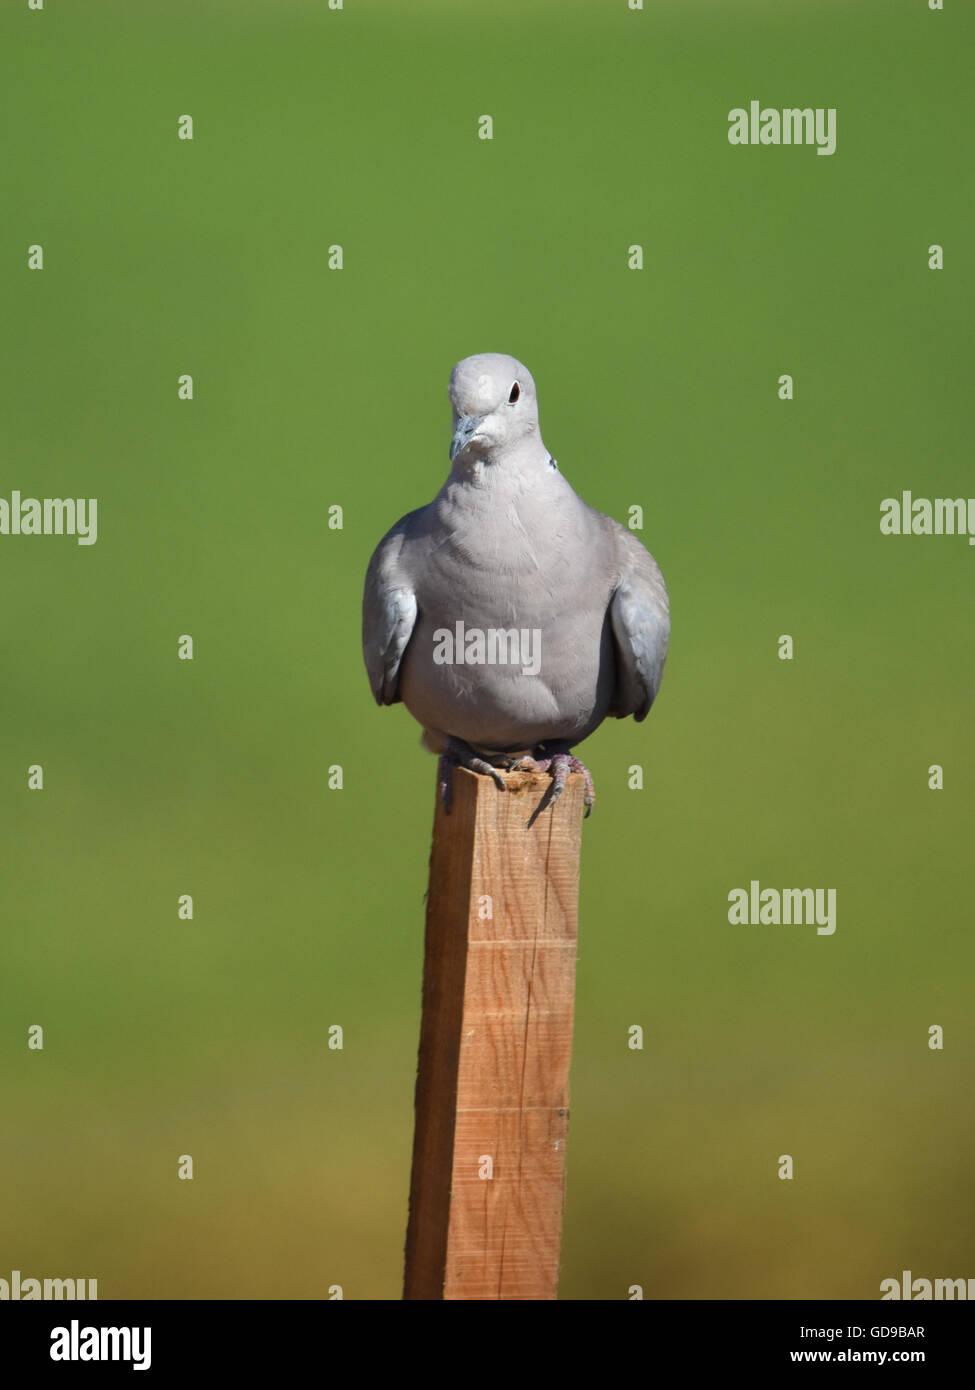 Eurasian collared dove (Streptopelia decaocto) Perching on stick Stock Photo